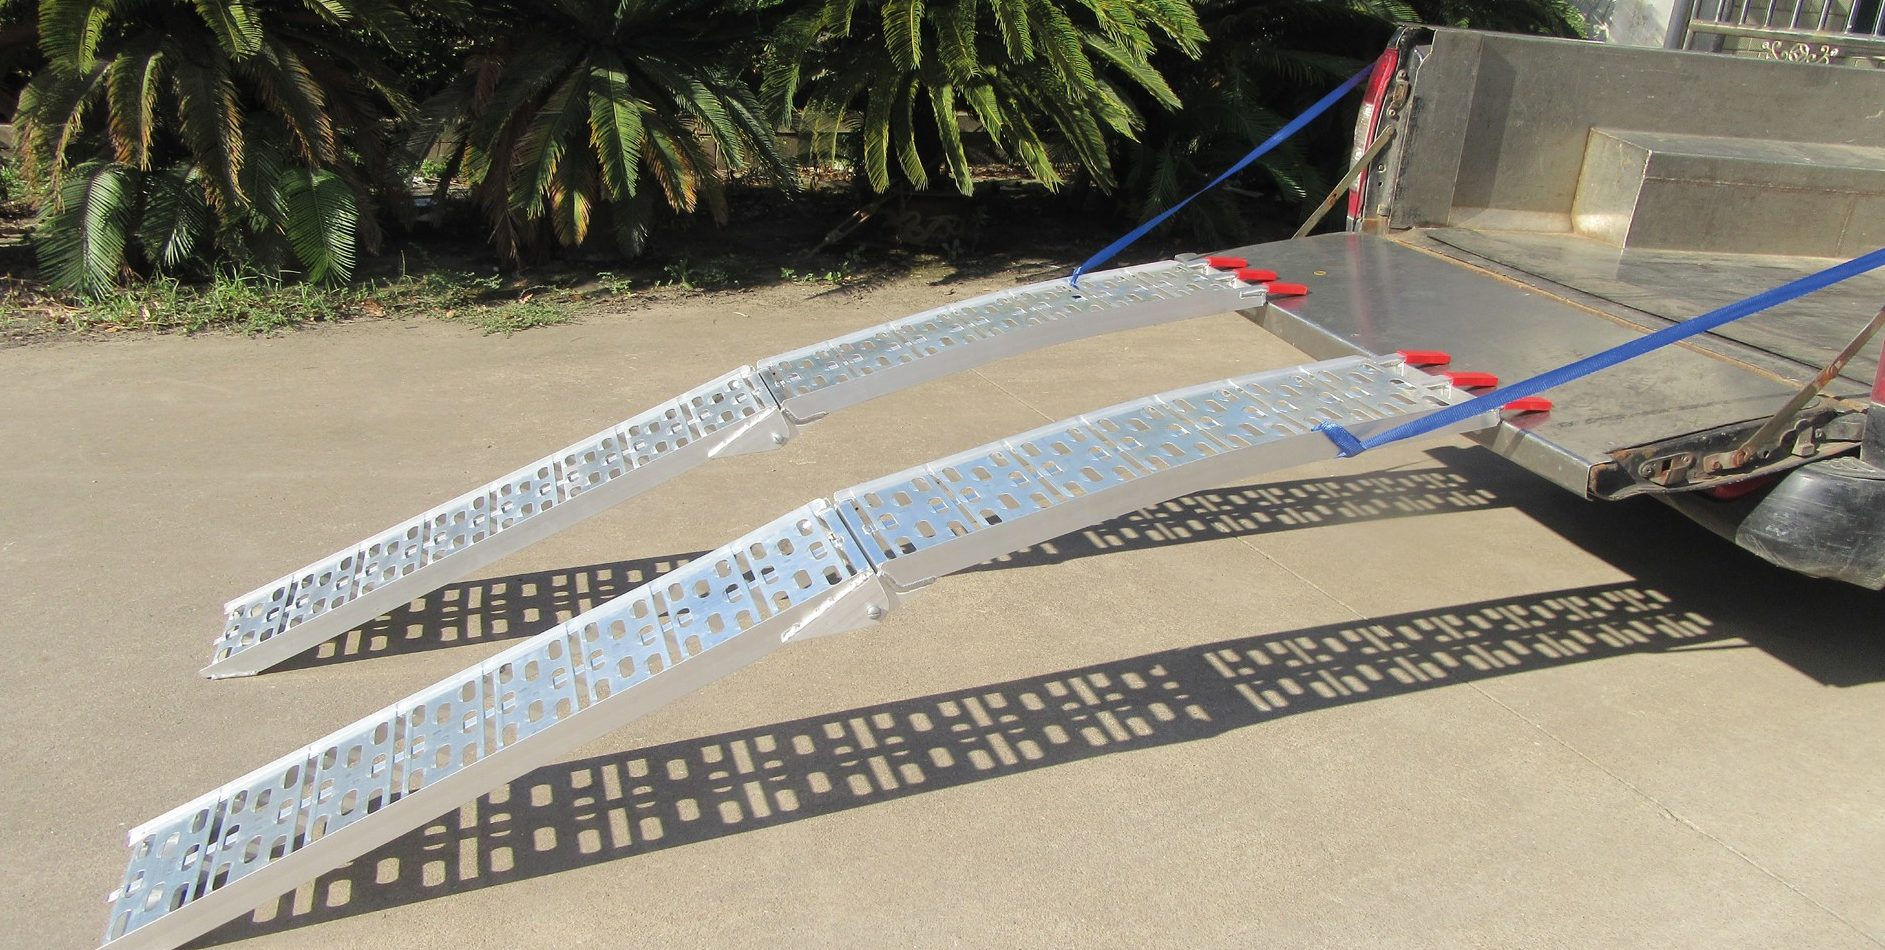 Rampes de chargement - image